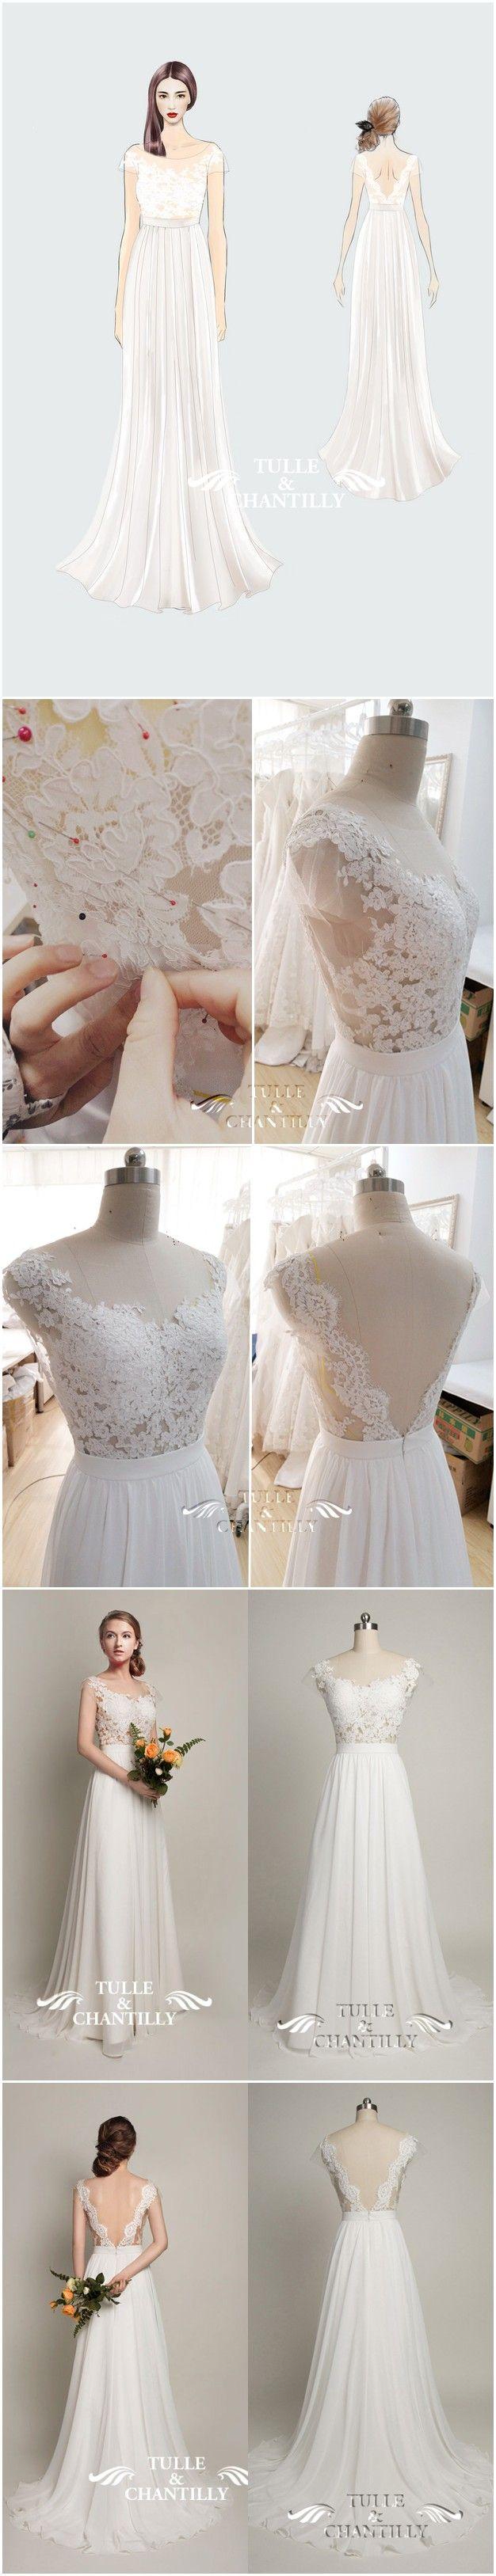 Fabulous  Design Your Own Wedding Dress Gorgeous Customized Long Chiffon Wedding Dress with Scalloped Lace V Shaped Back